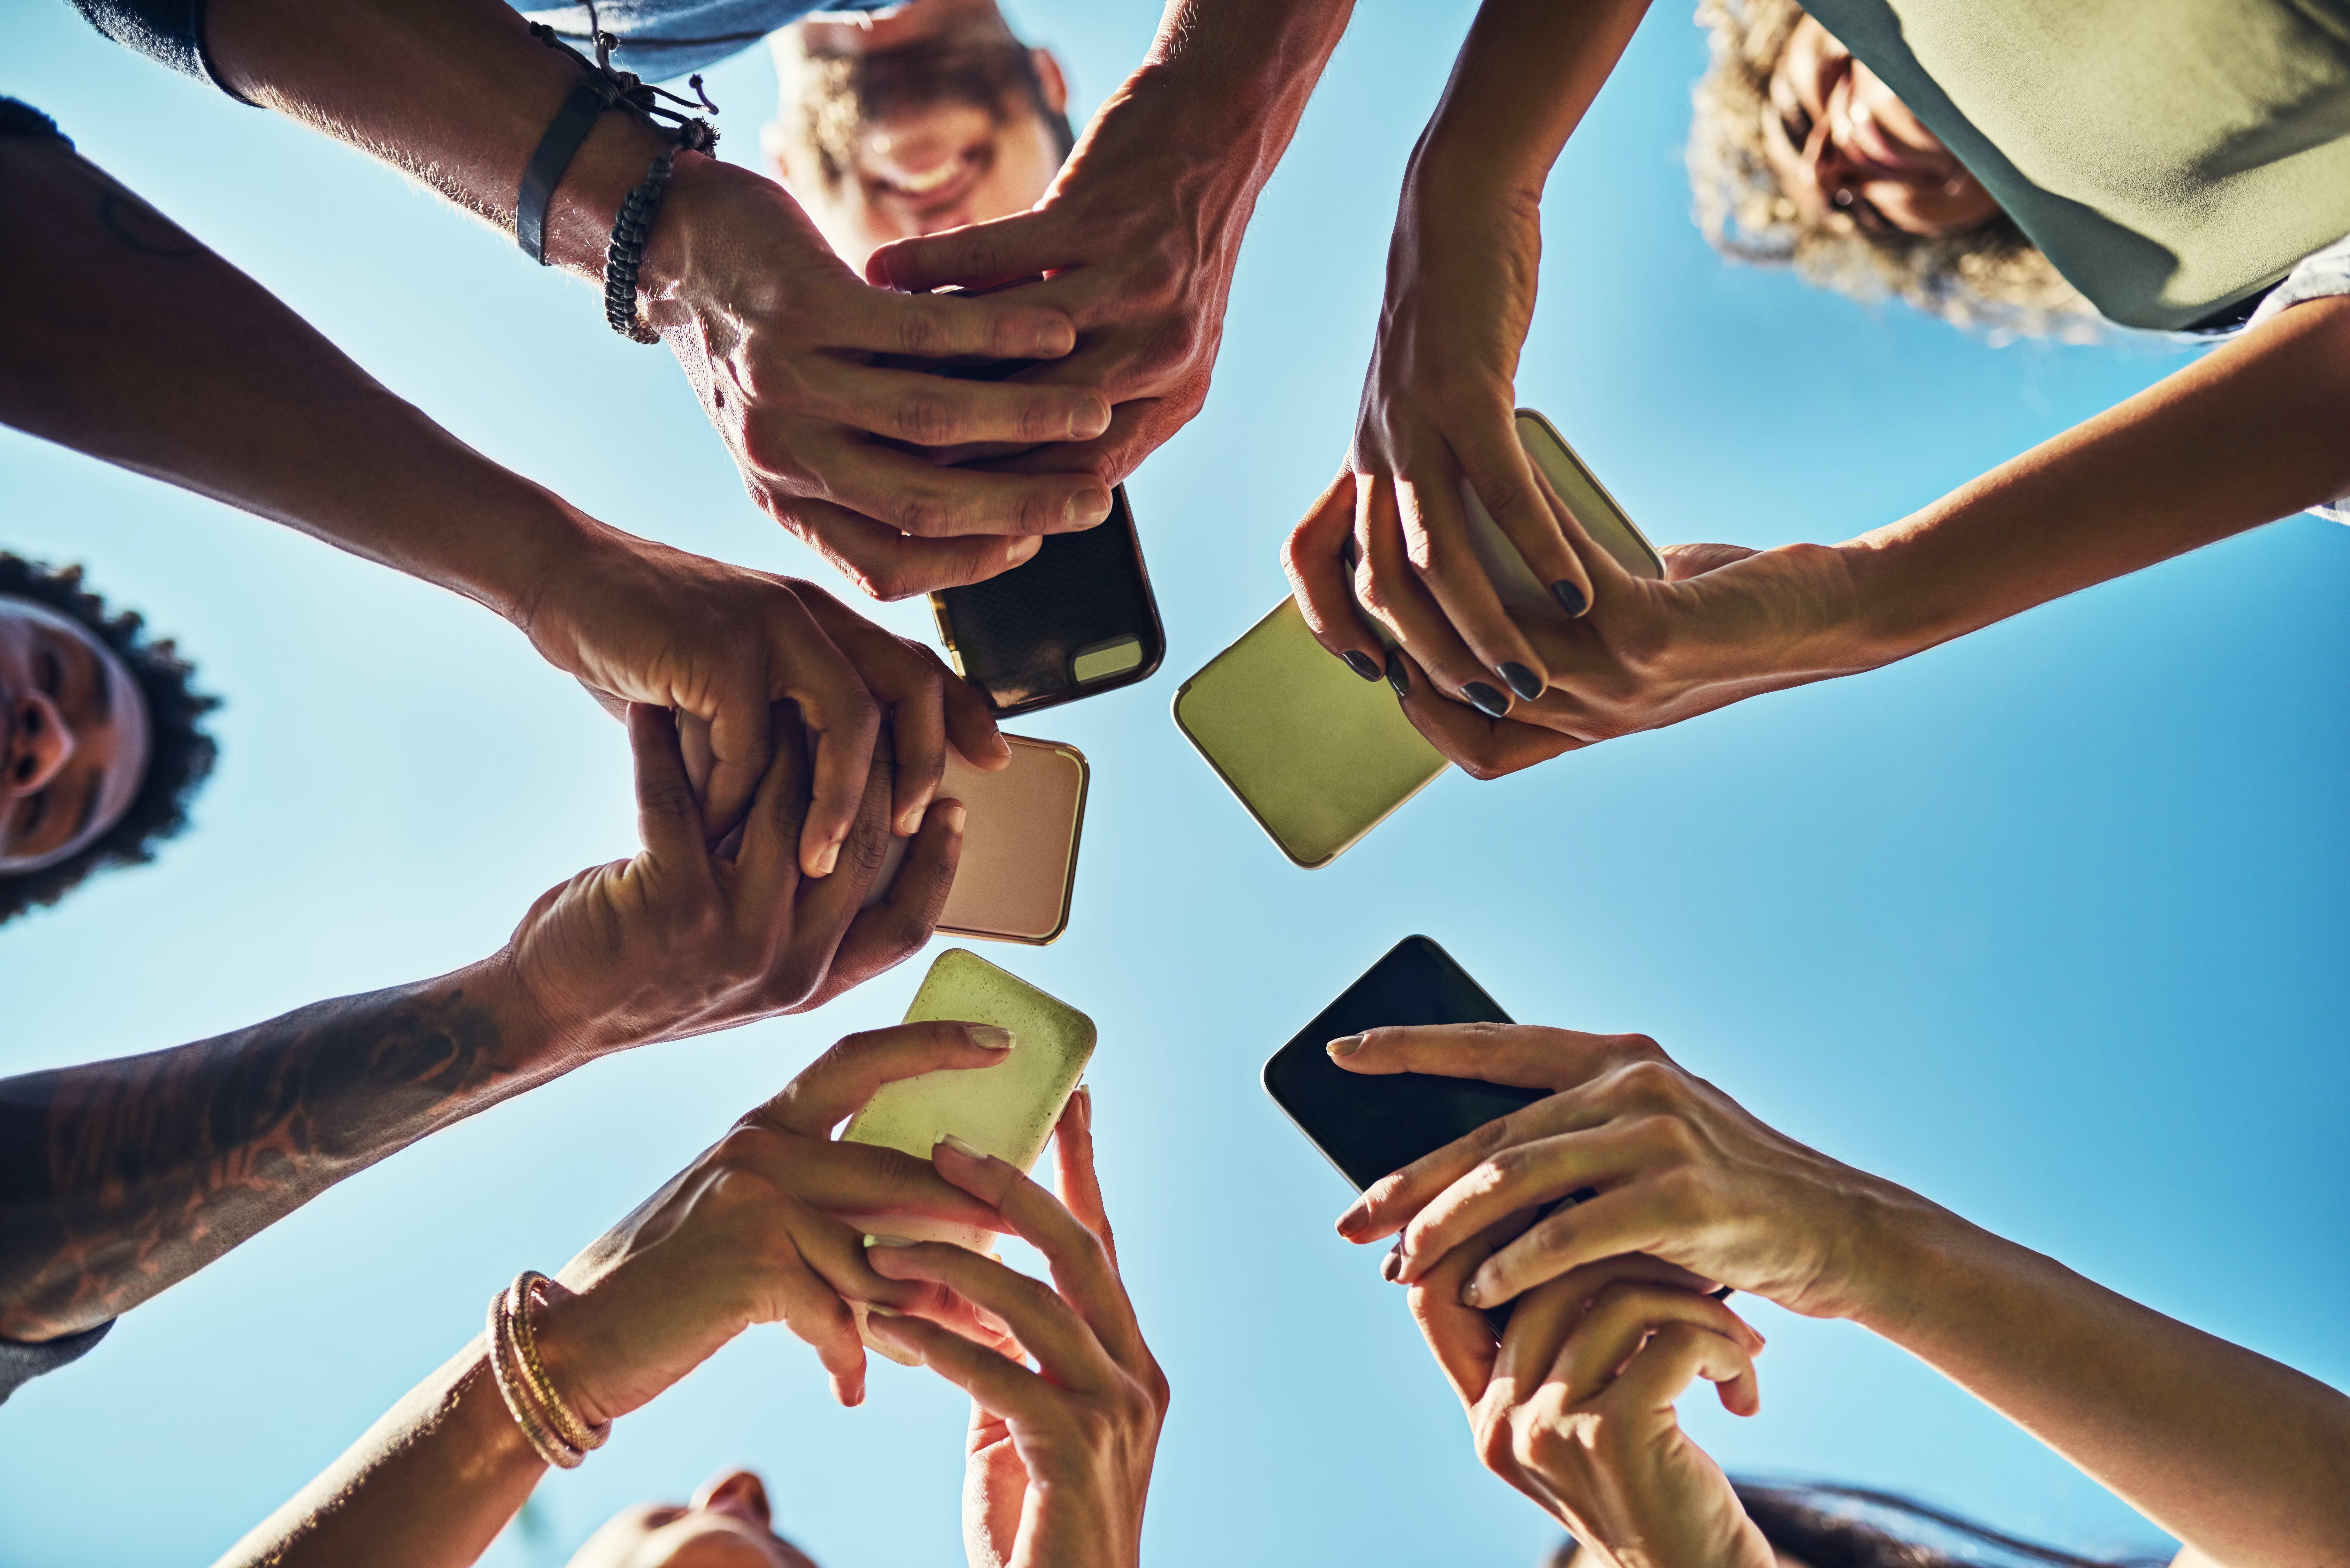 Measuring ROI on Influencer Marketing